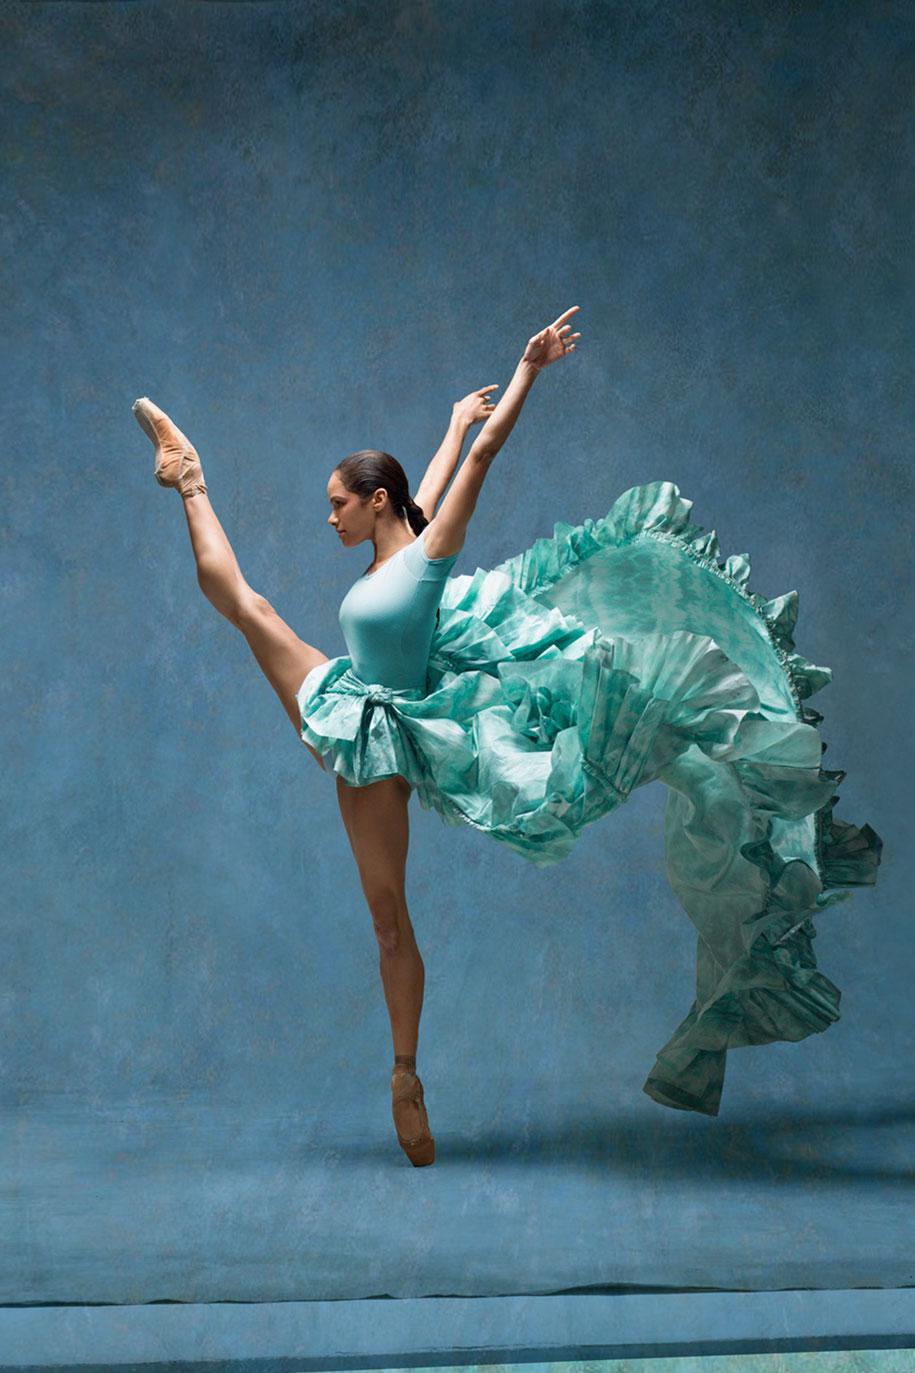 edgar-degas-ballet-dancer-painting-photoshoot-misty-copeland-harpers-bazaar-6